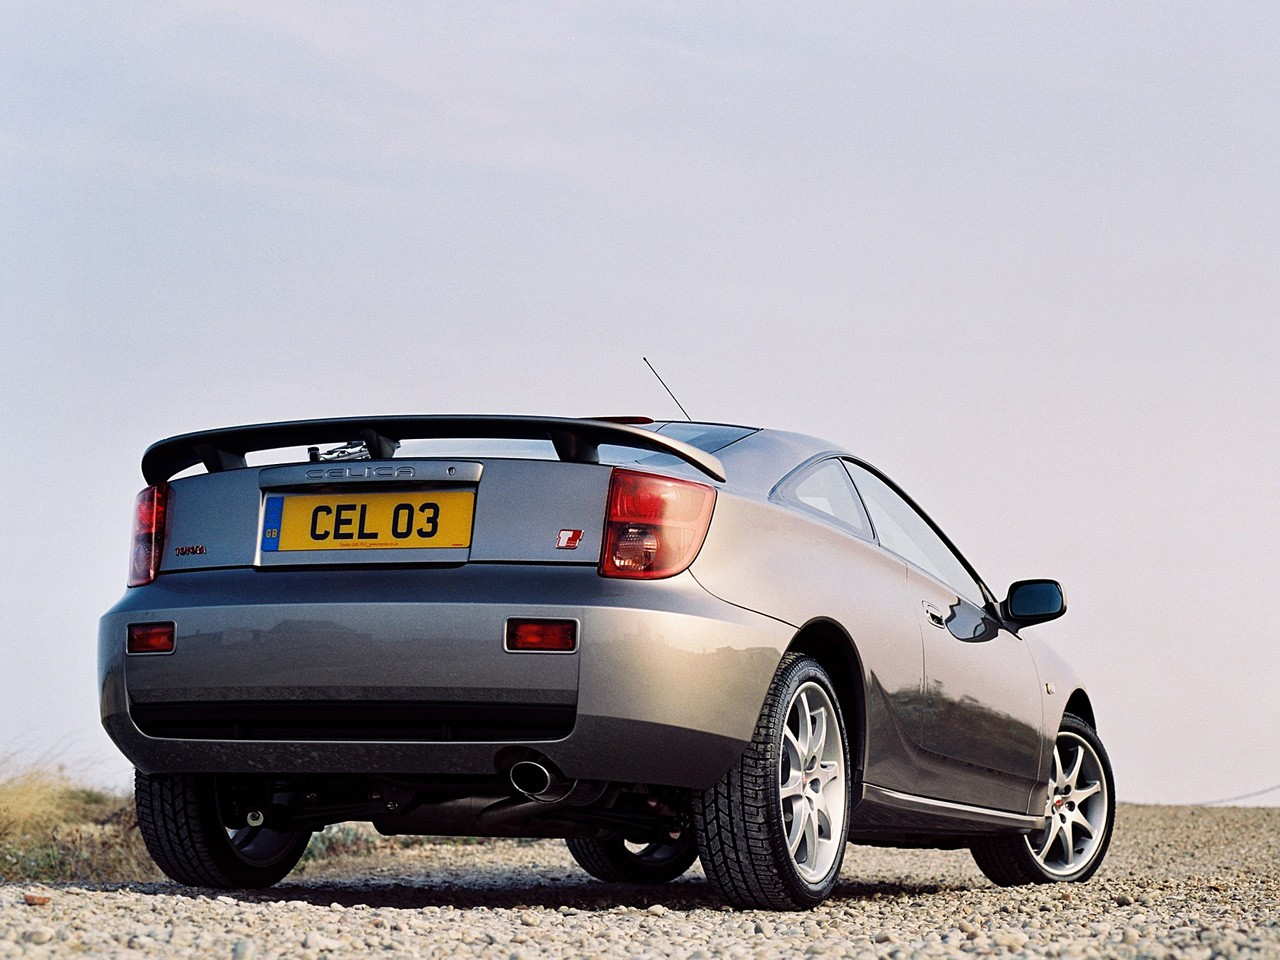 all new camry hybrid 2019 grand veloz facelift toyota celica specs & photos - 2002, 2003, 2004, 2005 ...